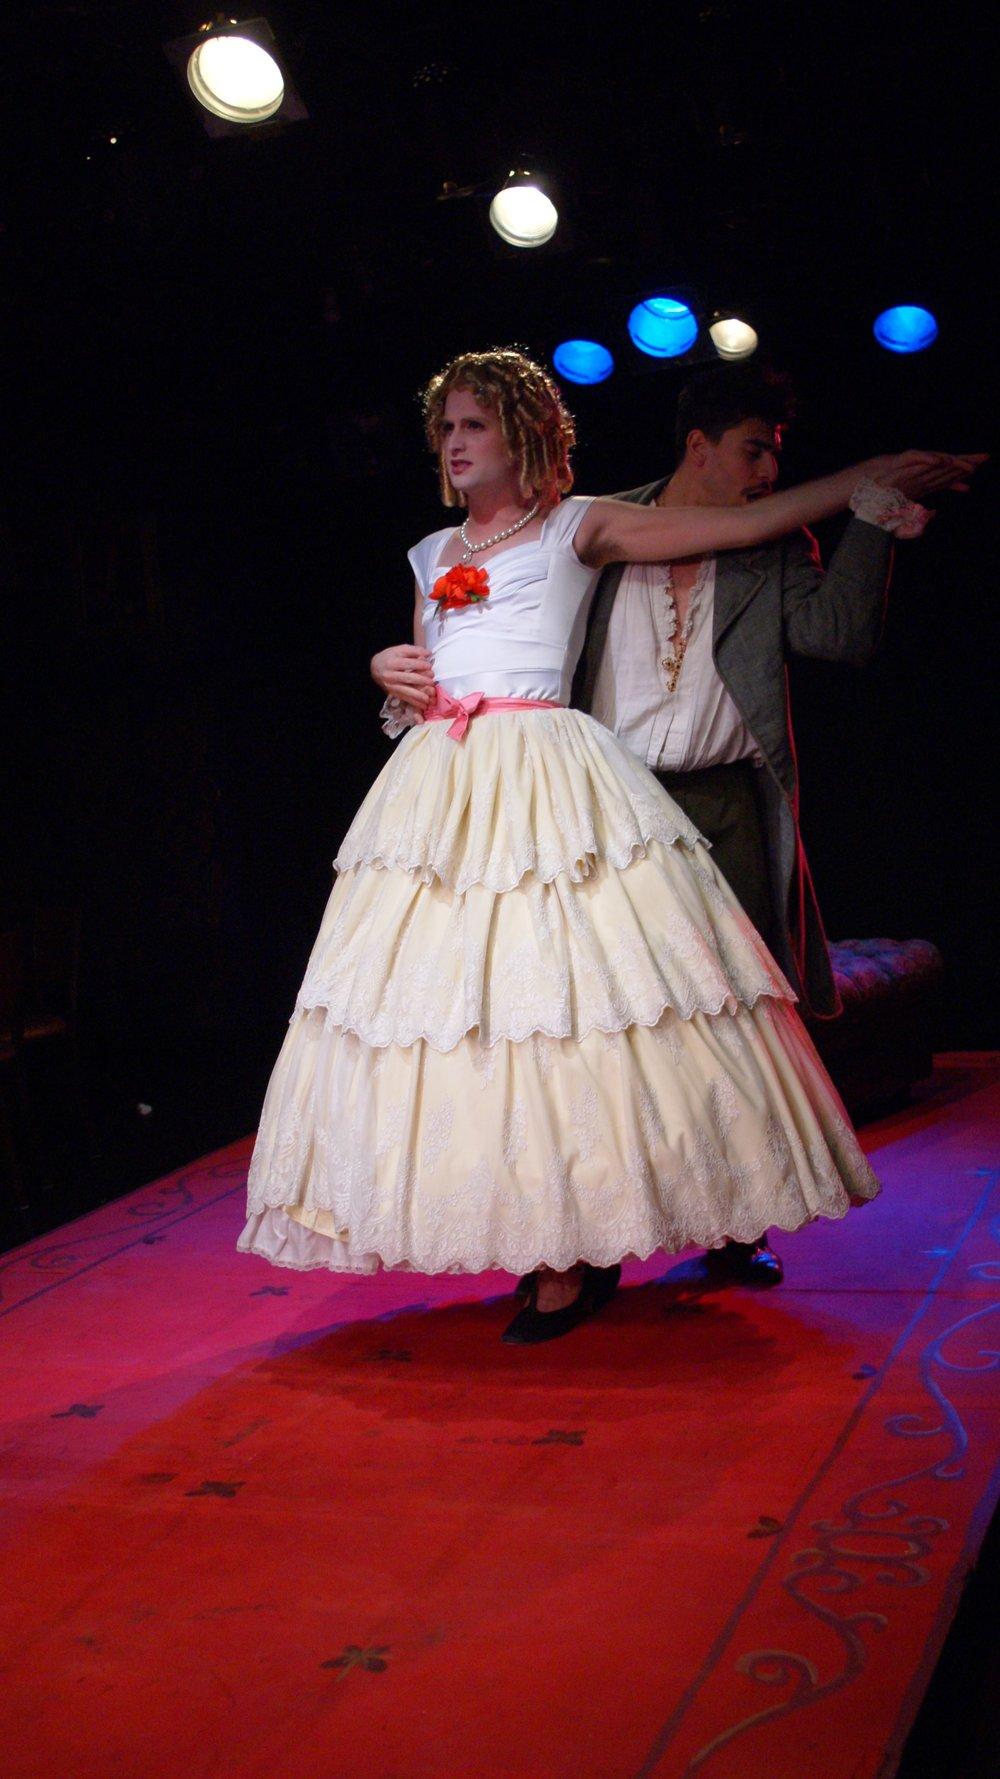 Marguerite Gautier (Michael Breslin), Armand Duval (Arturo Soria) (photos by Steph Waaser)